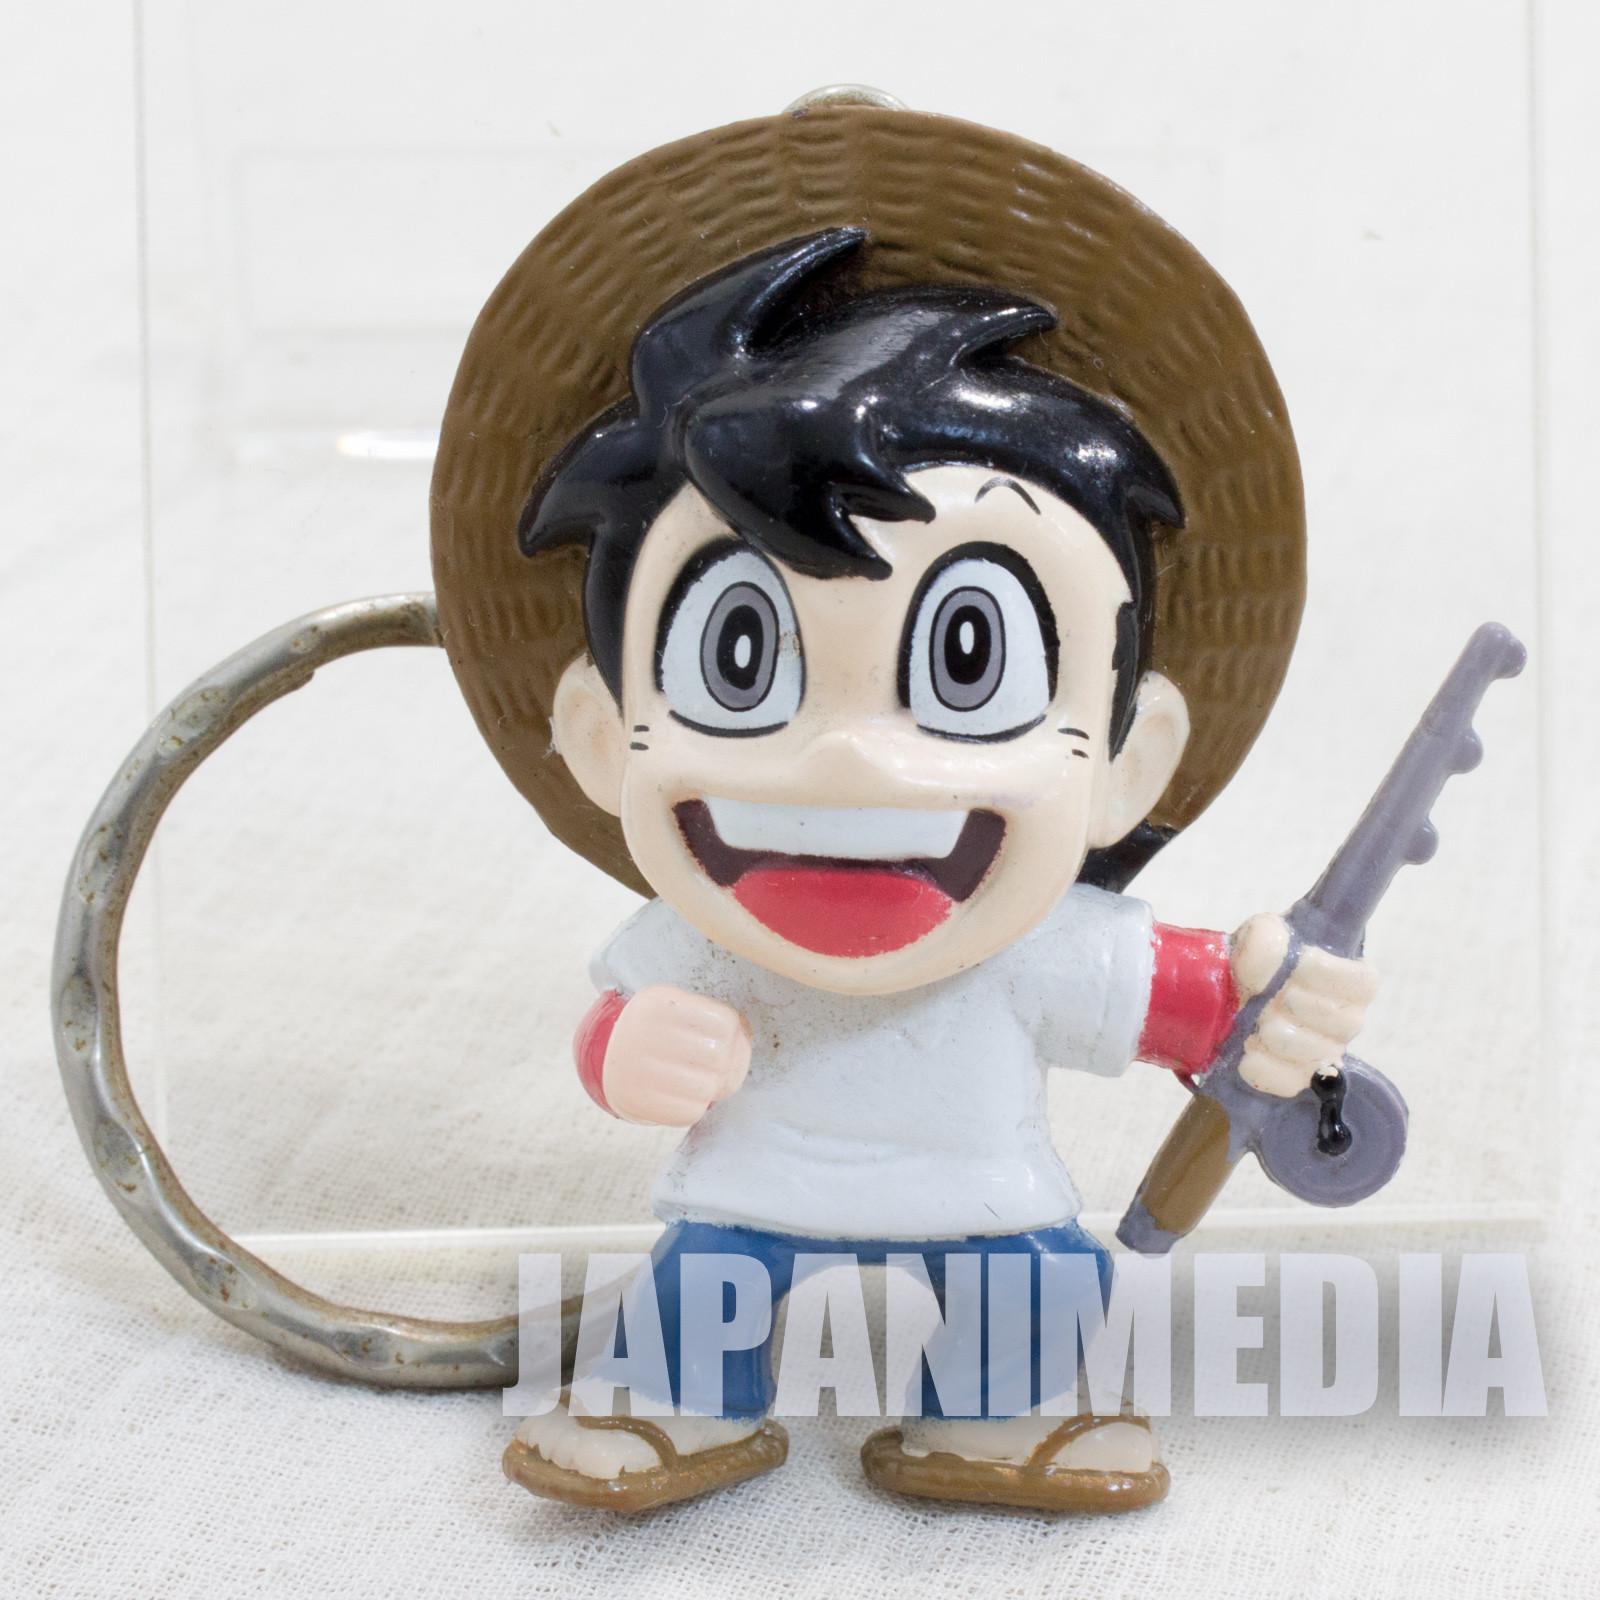 RARE! Fishing Crazy Tsurikichi Sanpei Figure Keychain JAPAN ANIME MANGA